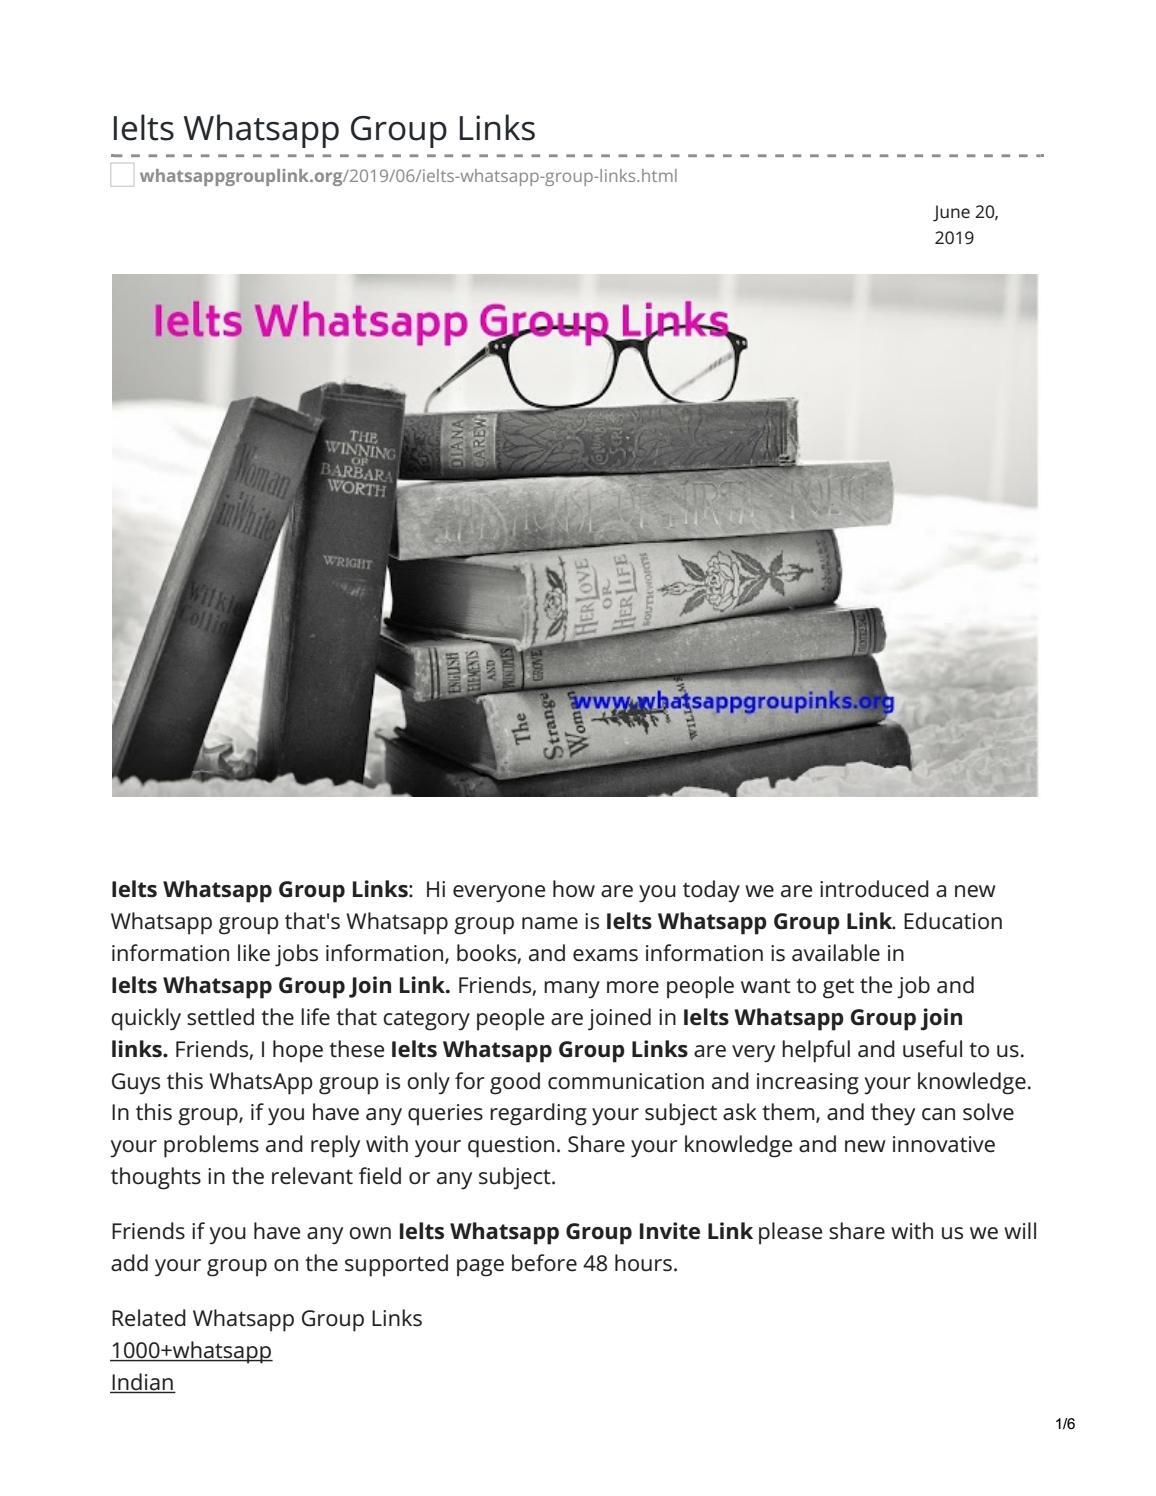 Ielts Whatsapp Group Links by whatsappgrouplinks77 - issuu